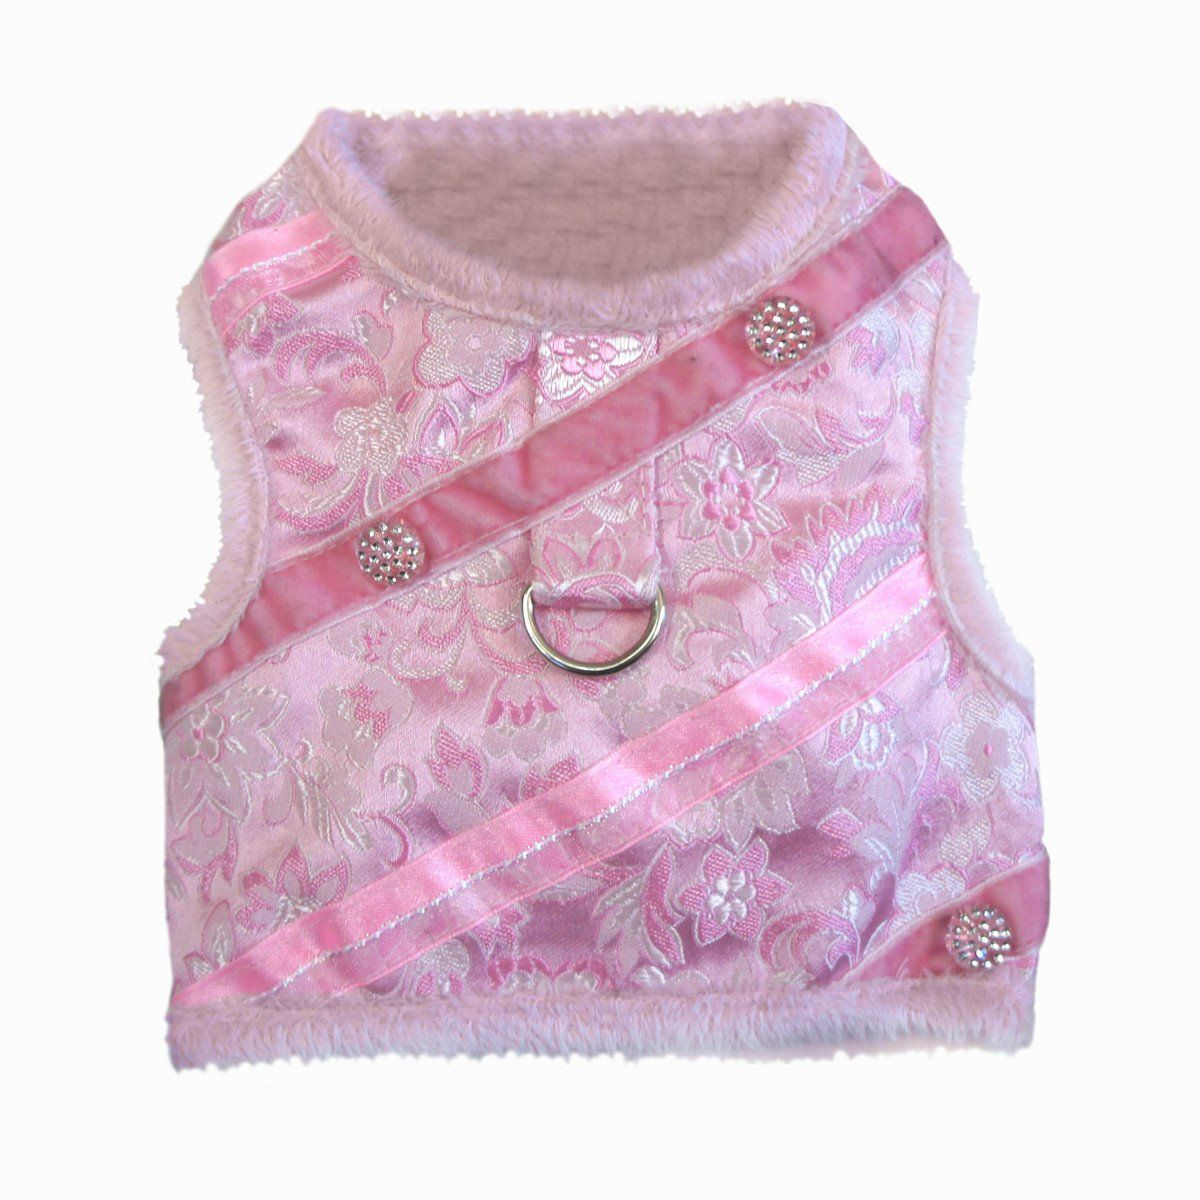 Doggie Design Pink Silver Brocade Jeweled Plush Faux Minky